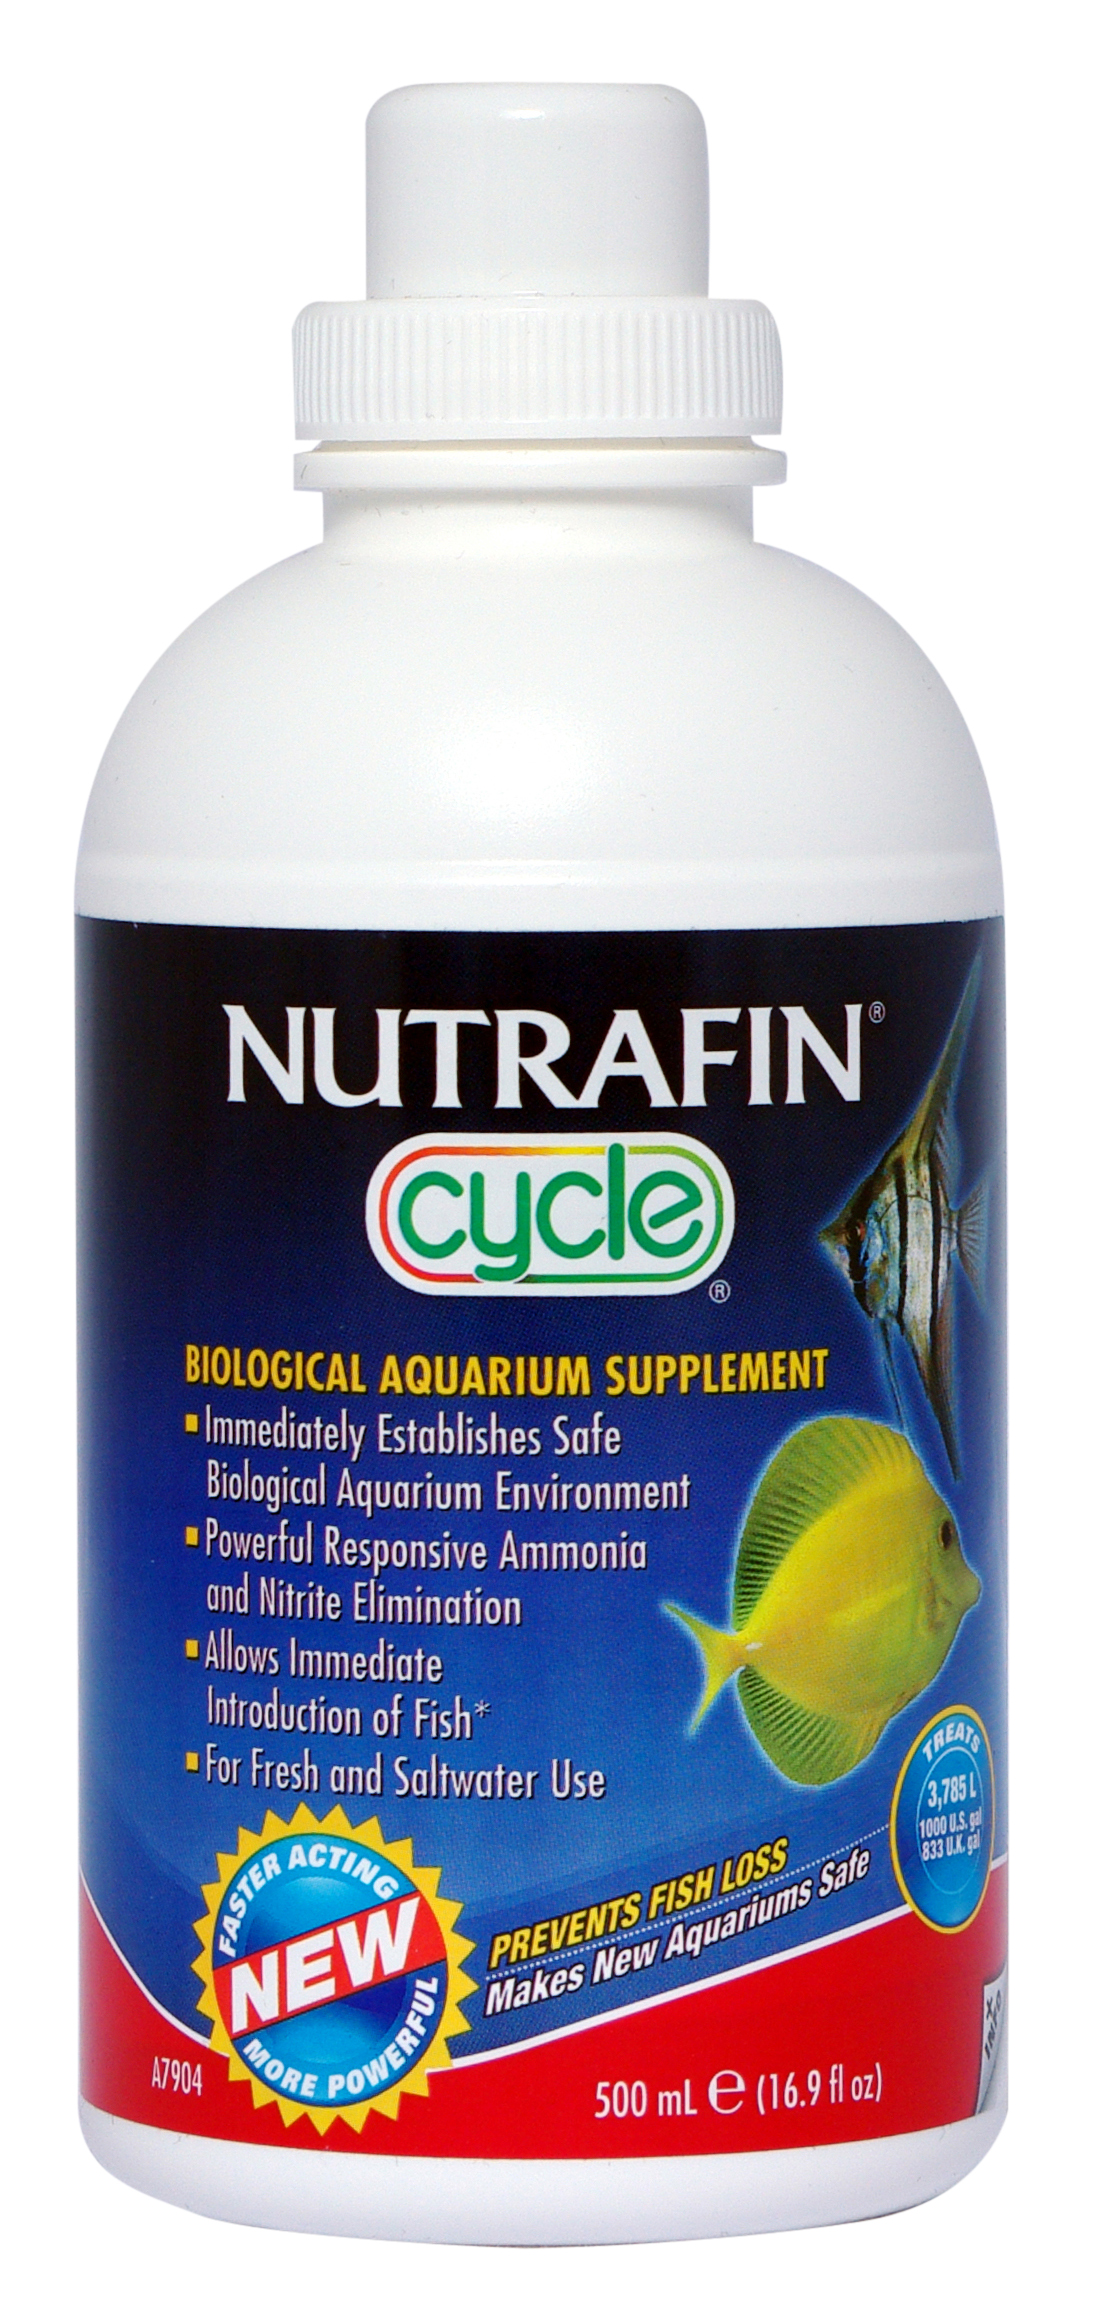 Nutrafin Cycle - Biological Aquarium Supplement 500